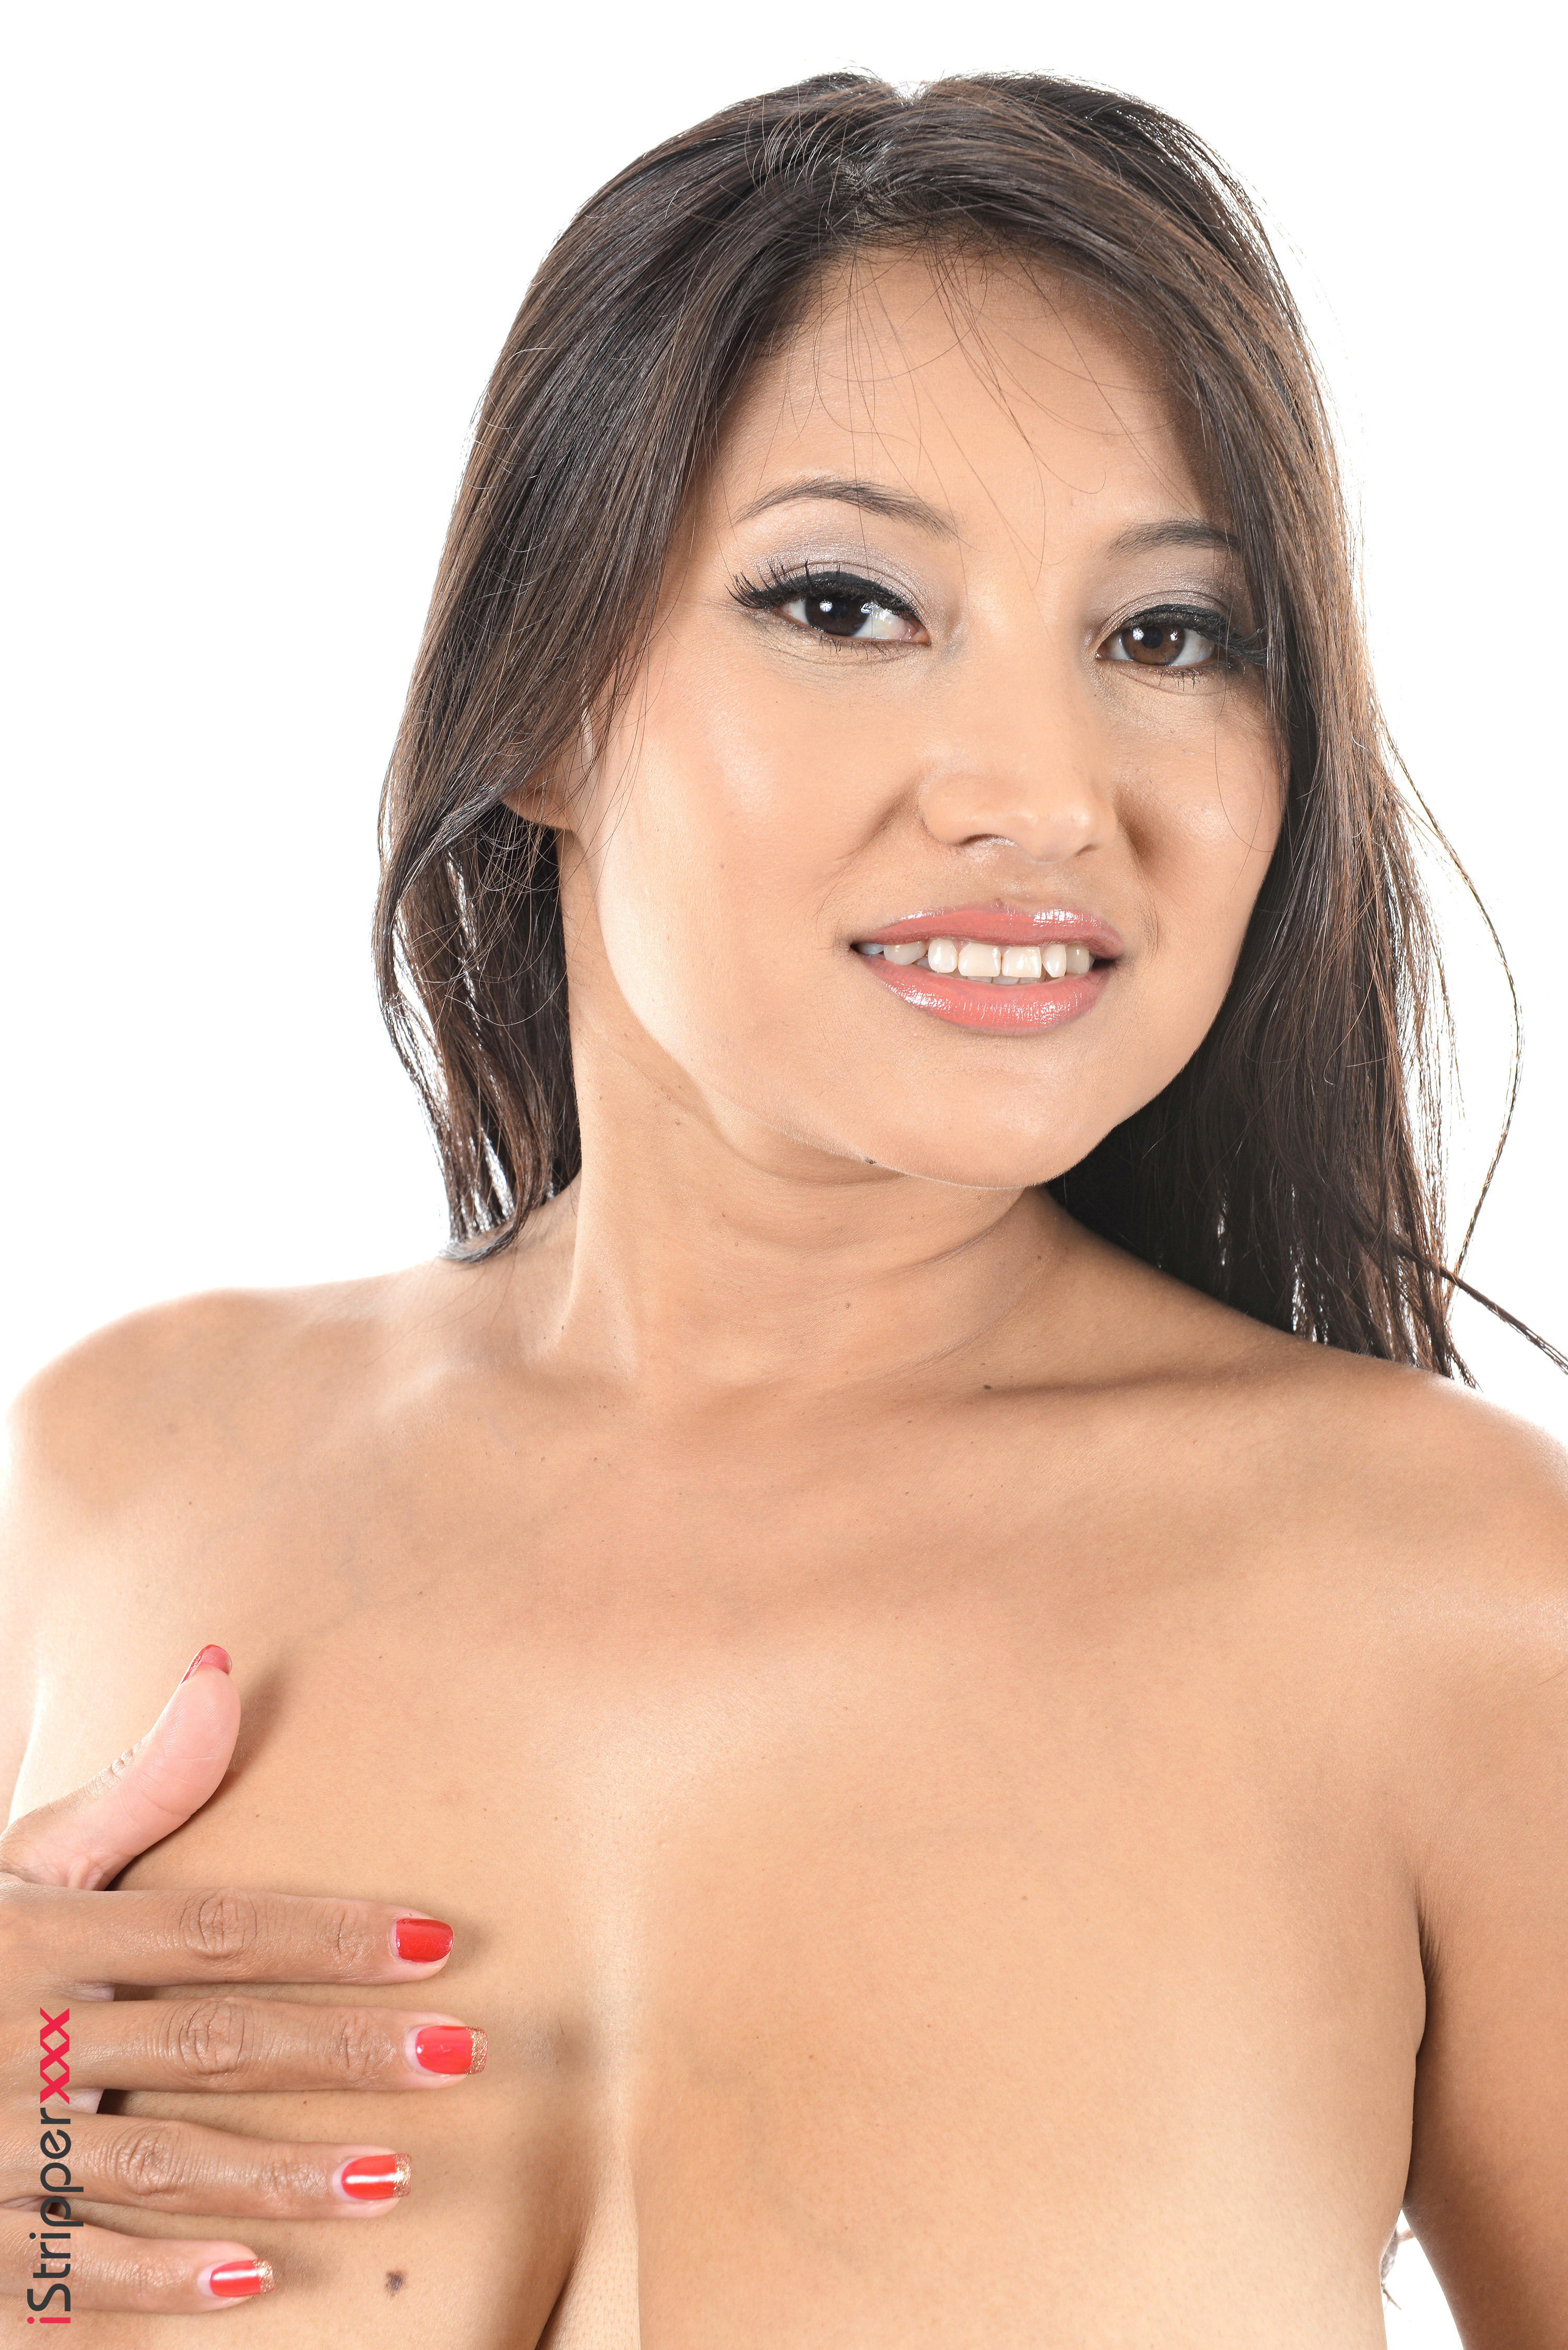 porn actress hd wallpaper